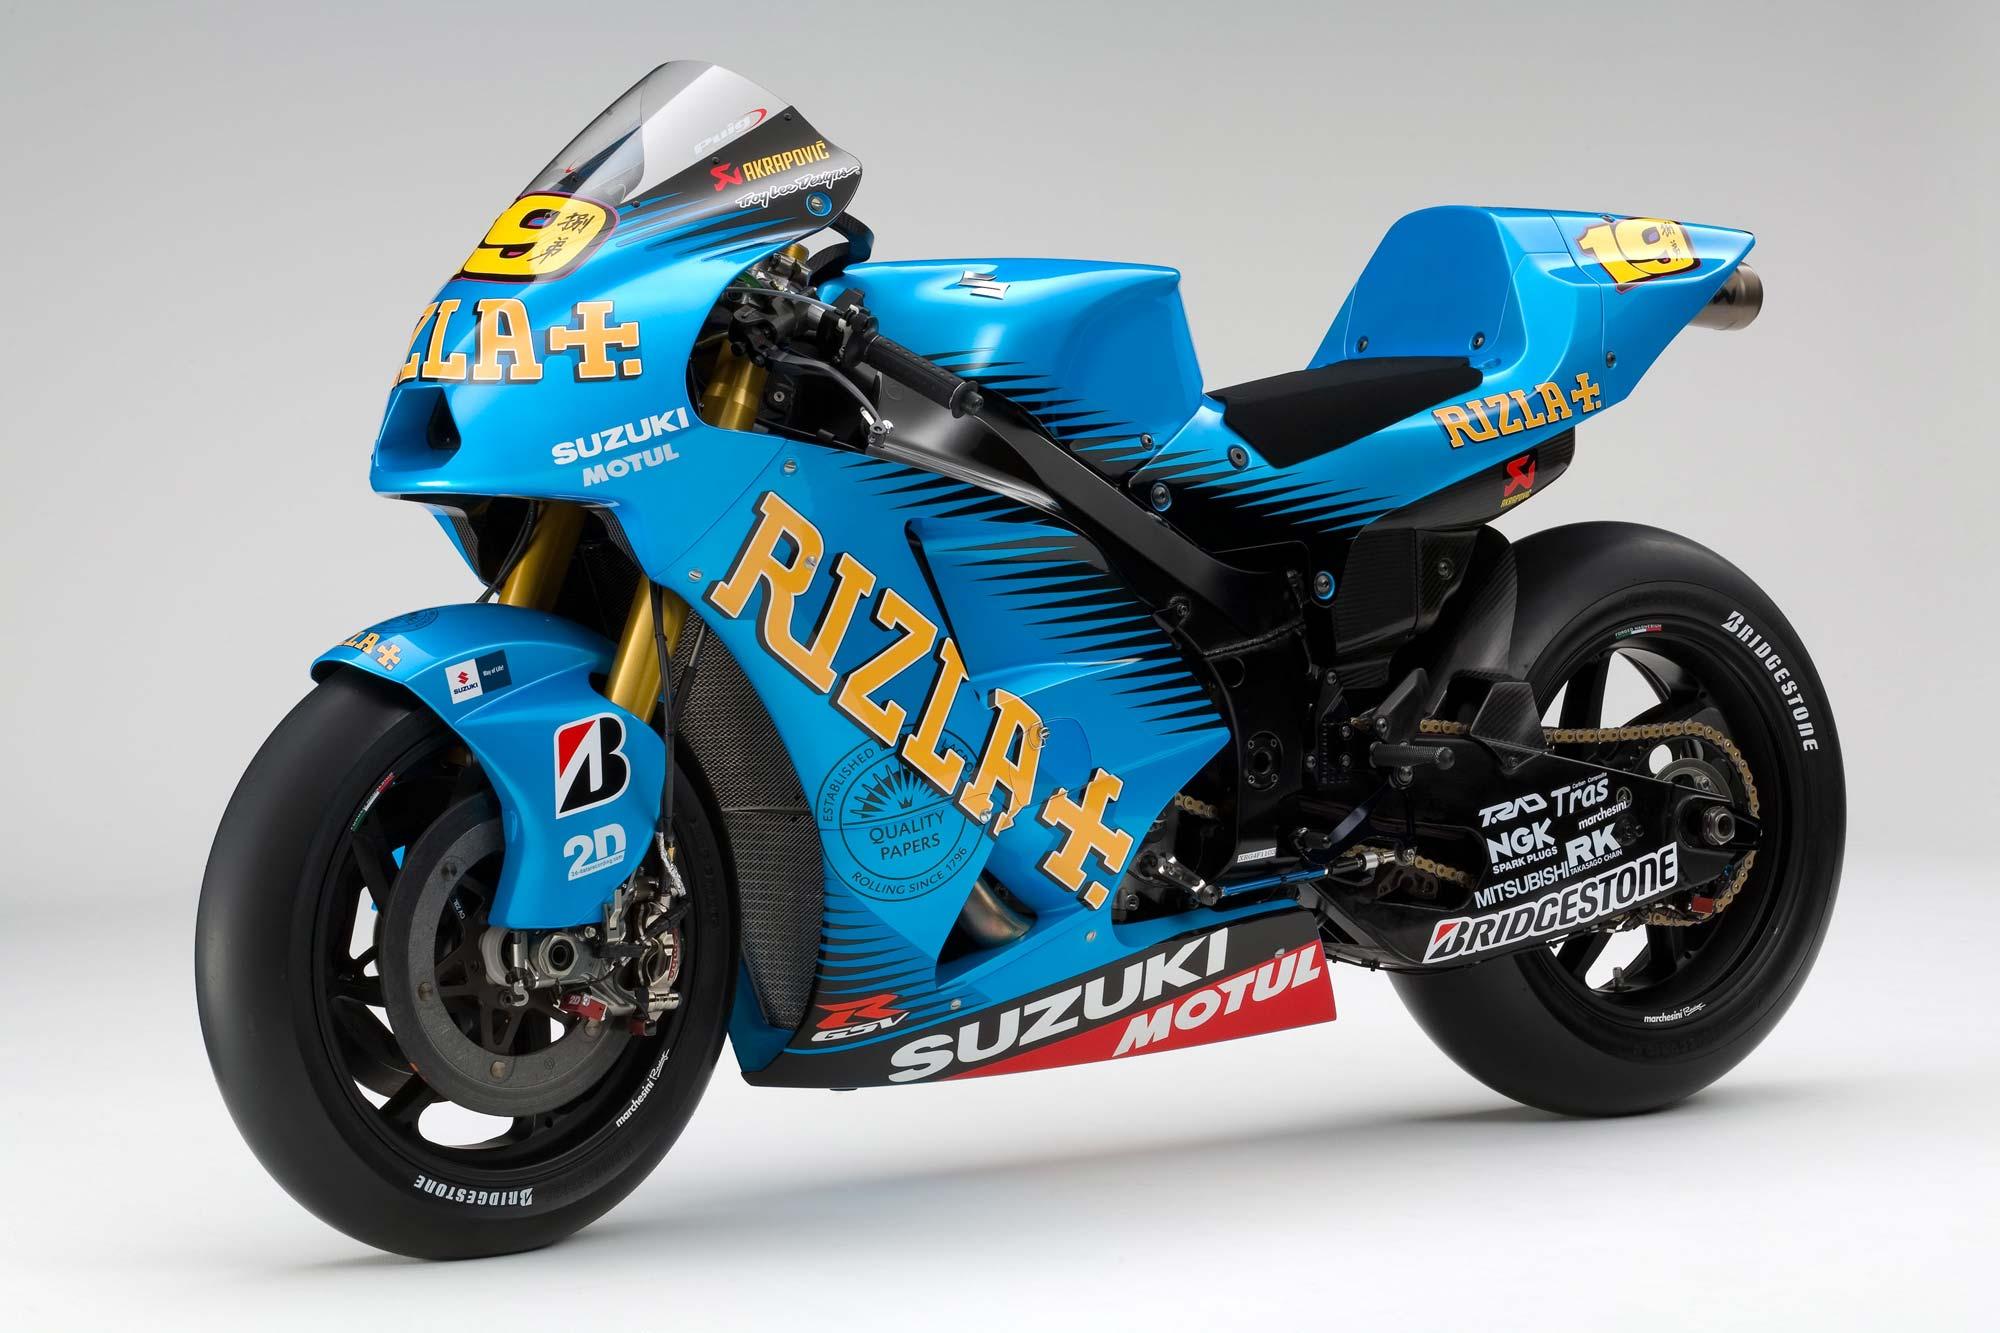 2011 Rizla Suzuki GSV-R MotoGP Race Bike Unveiled - Asphalt & Rubber